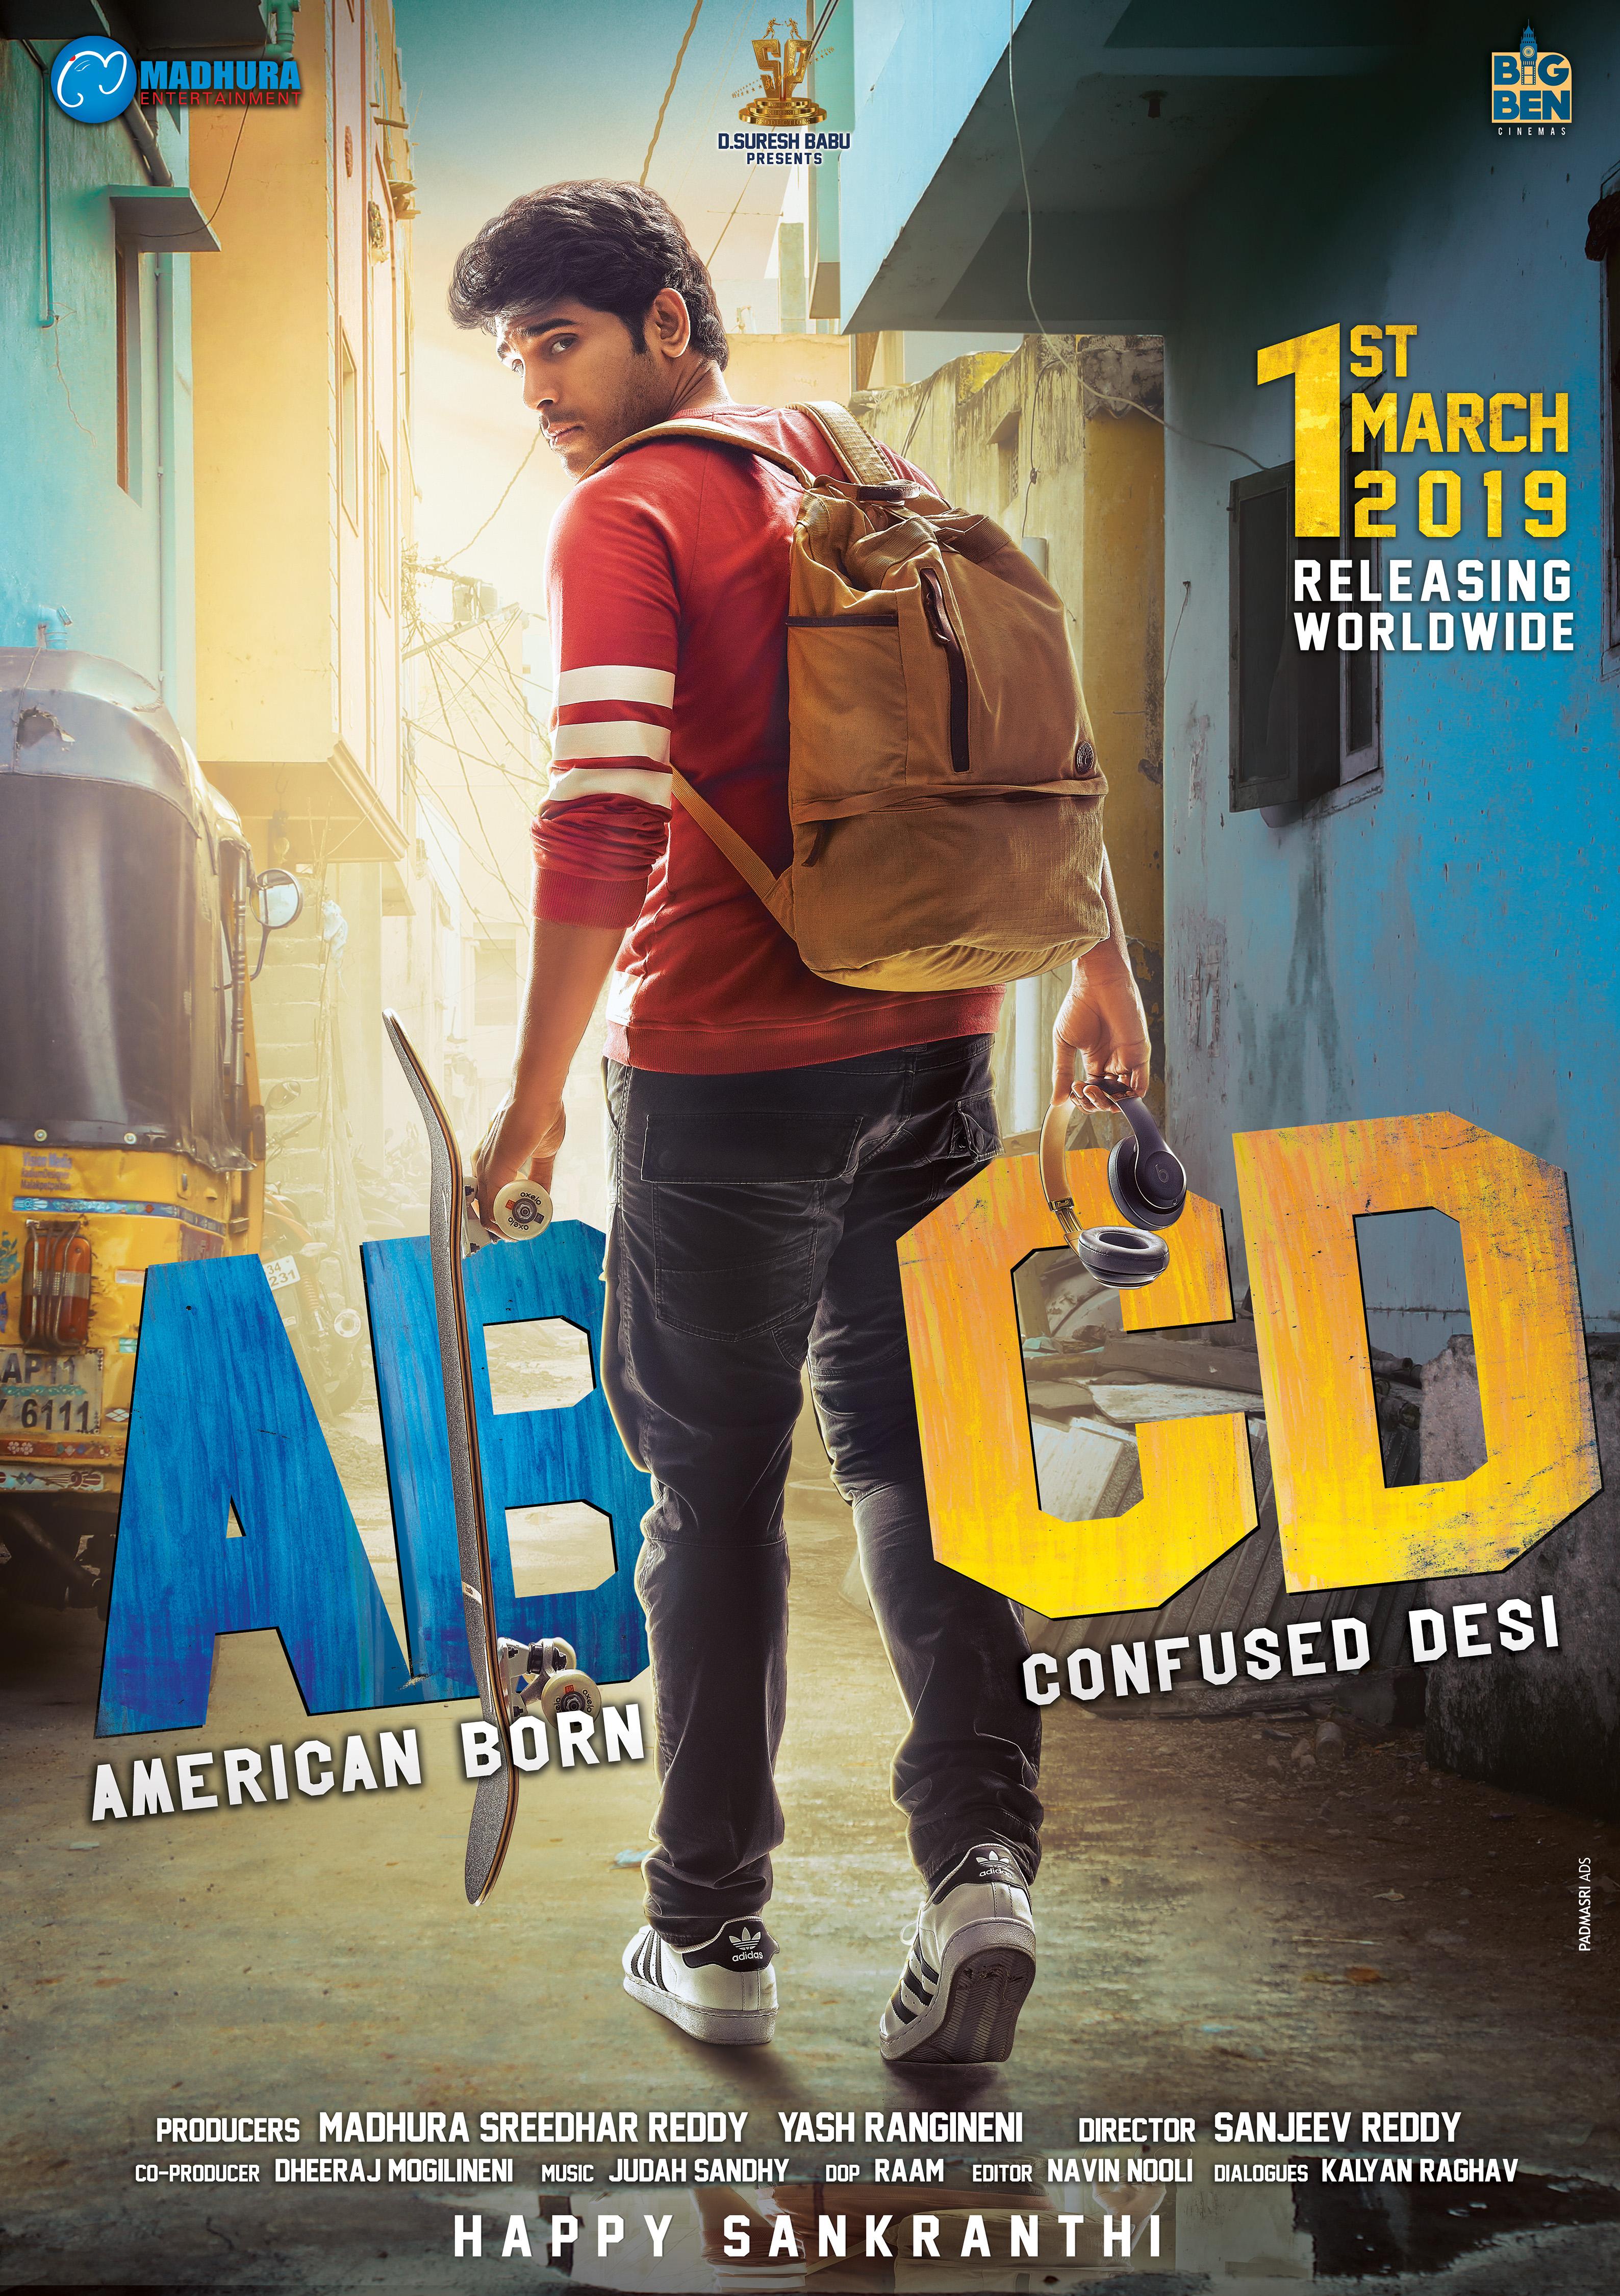 Allu Sirish ABCD Movie Grand Release On 1st March